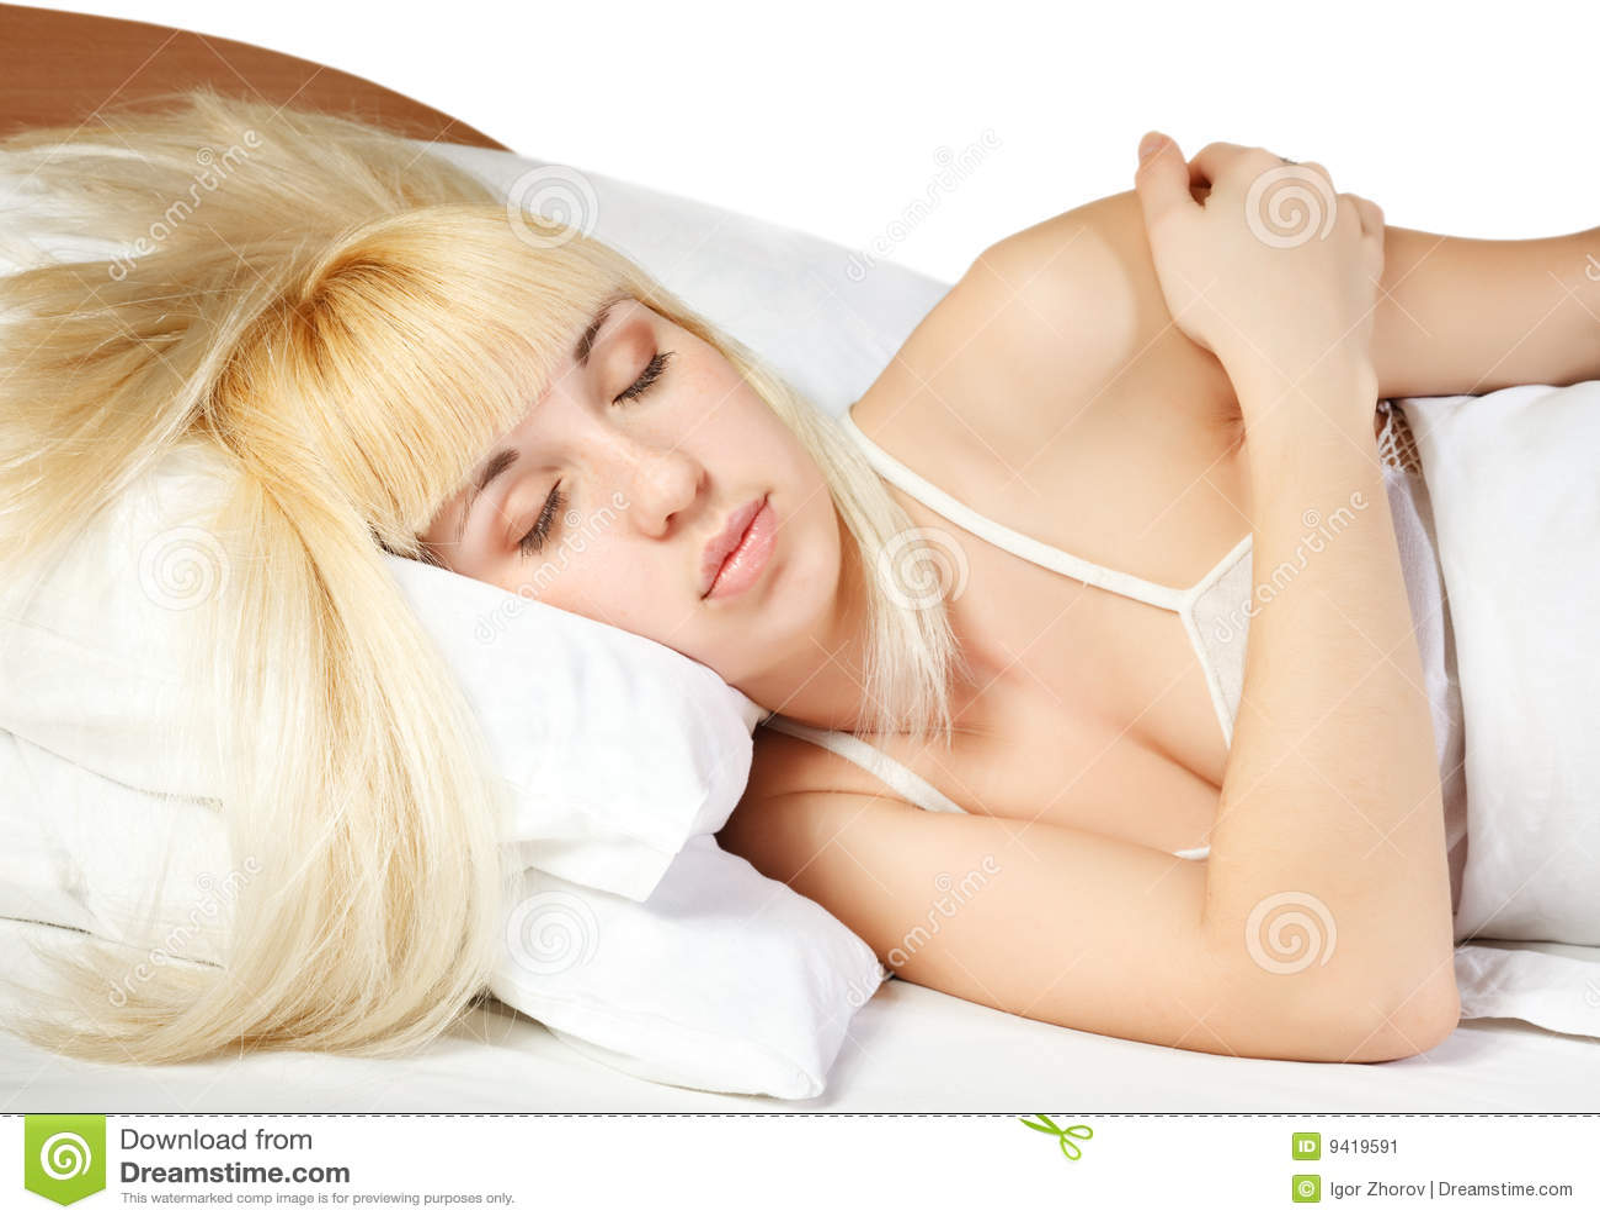 Free girl having wet orgasm porn video